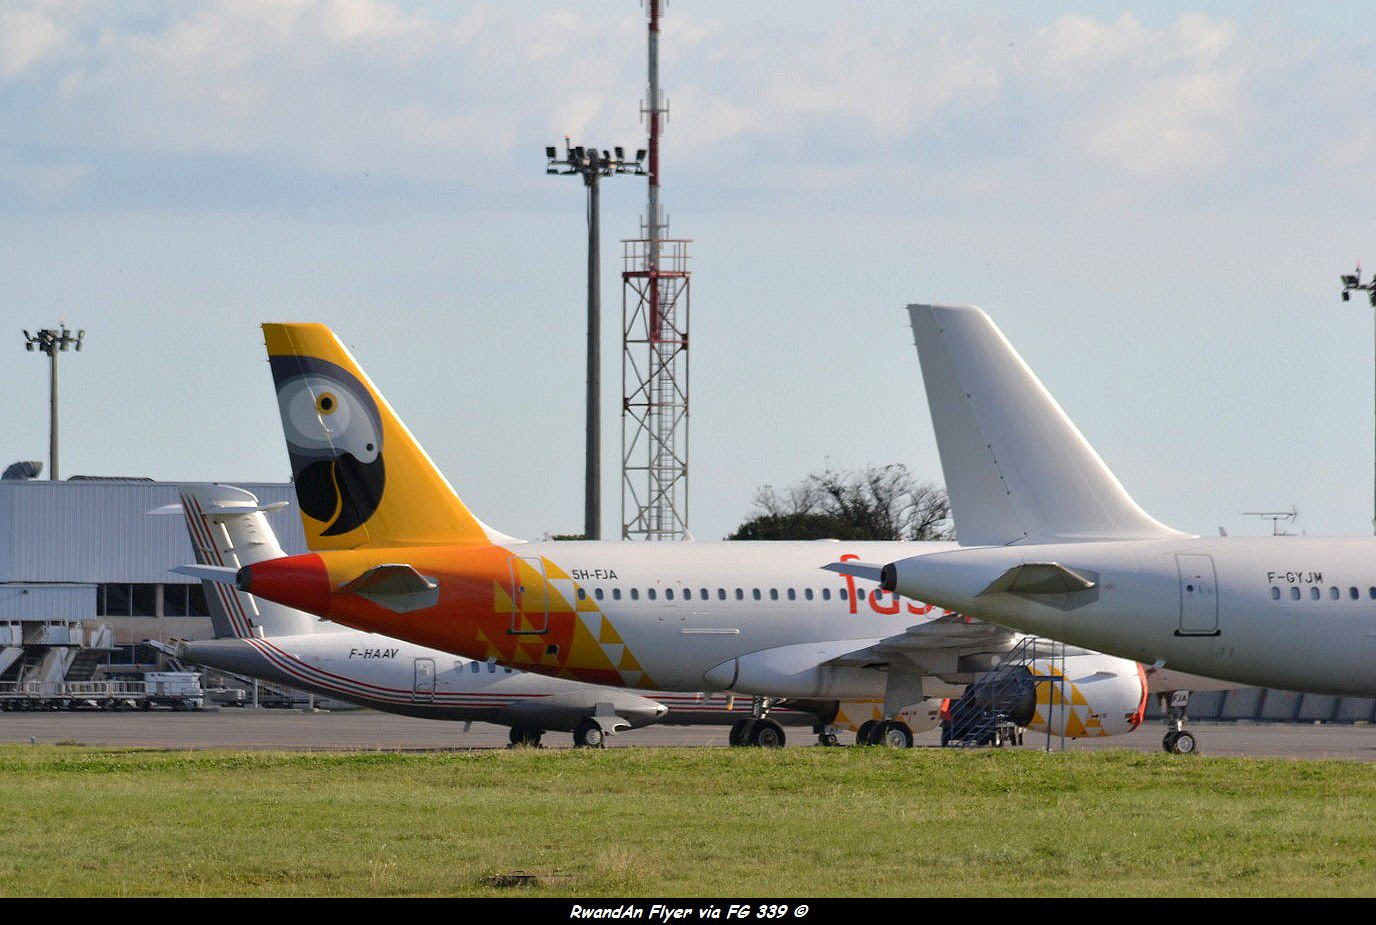 fastjet A319 5H-FJA in Montpellier